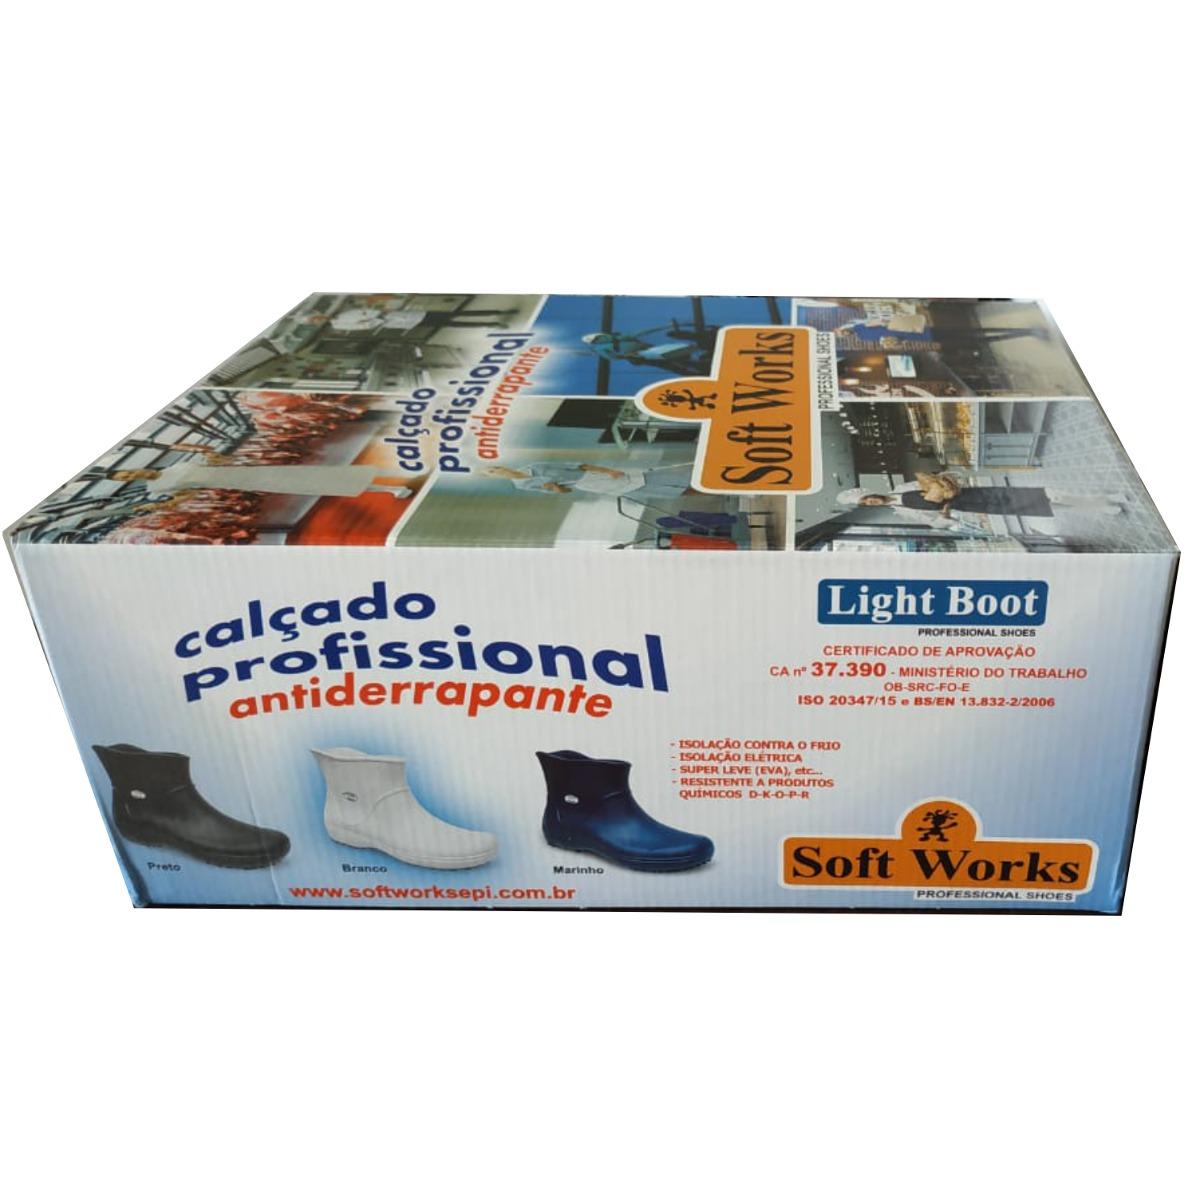 d02b81e743b2c 5 Bota Eva Cozinha Industrial Bb85 Antiderrapante - R  332,50 em ...